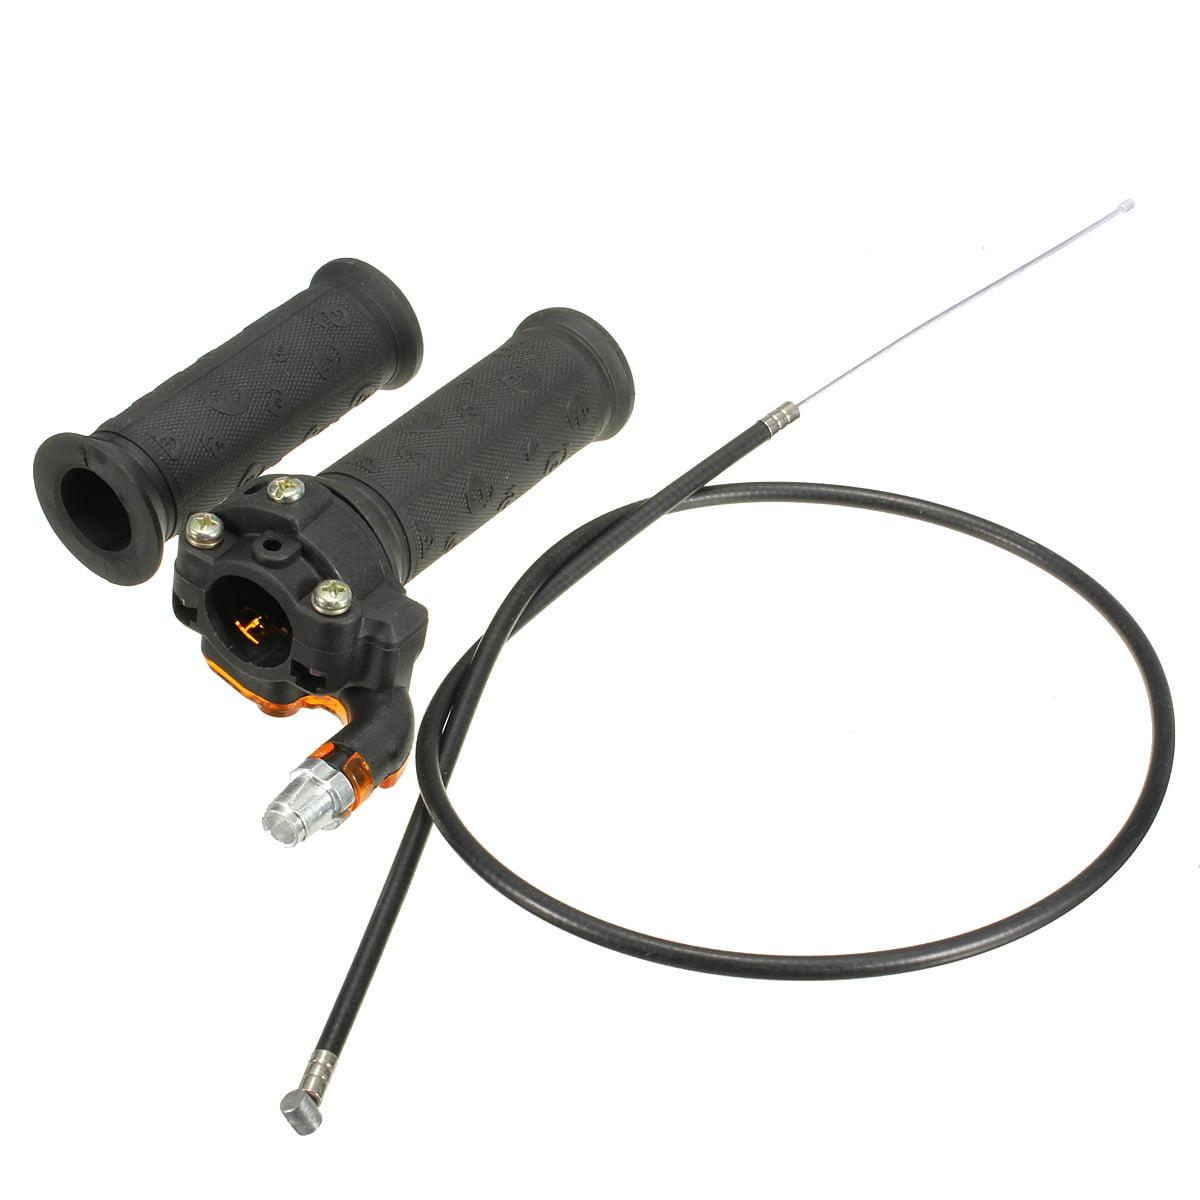 1 Set 90cc 110cc 125cc 140cc 150cc 200cc 250cc 4-stroke Dirt Bike Mini Bike 22mm7//8Inch Twist Throttle Accelerator Handle Grips Handle Grip + Cable + Throttle Clamp + Flameout Switch Fits 50cc